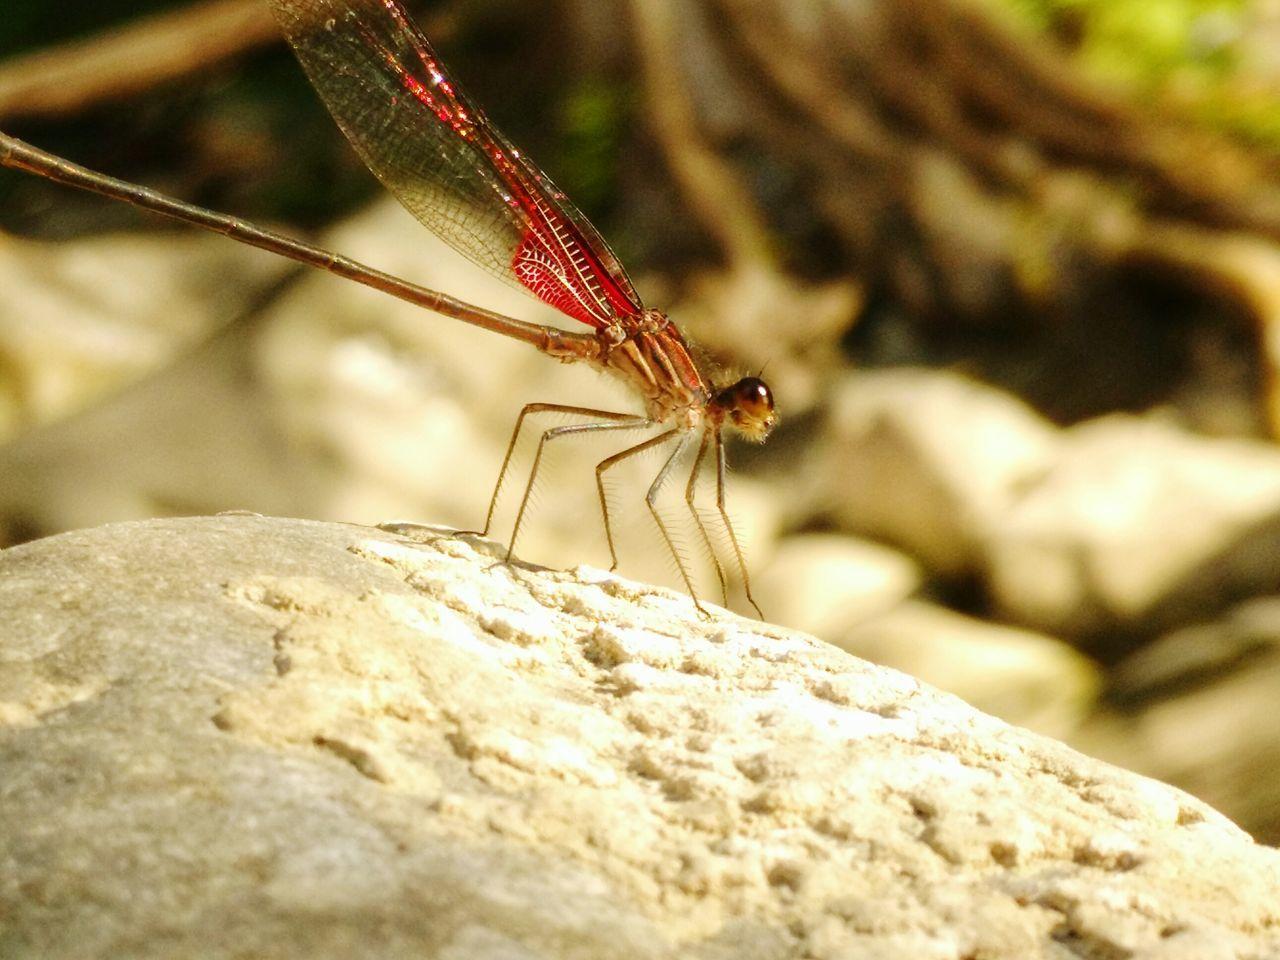 Río Raíces Allende NL. Libelula Libellule River Insects  Naturaleza Eyem Invertebrates Dragonfly Caballito Del Diablo